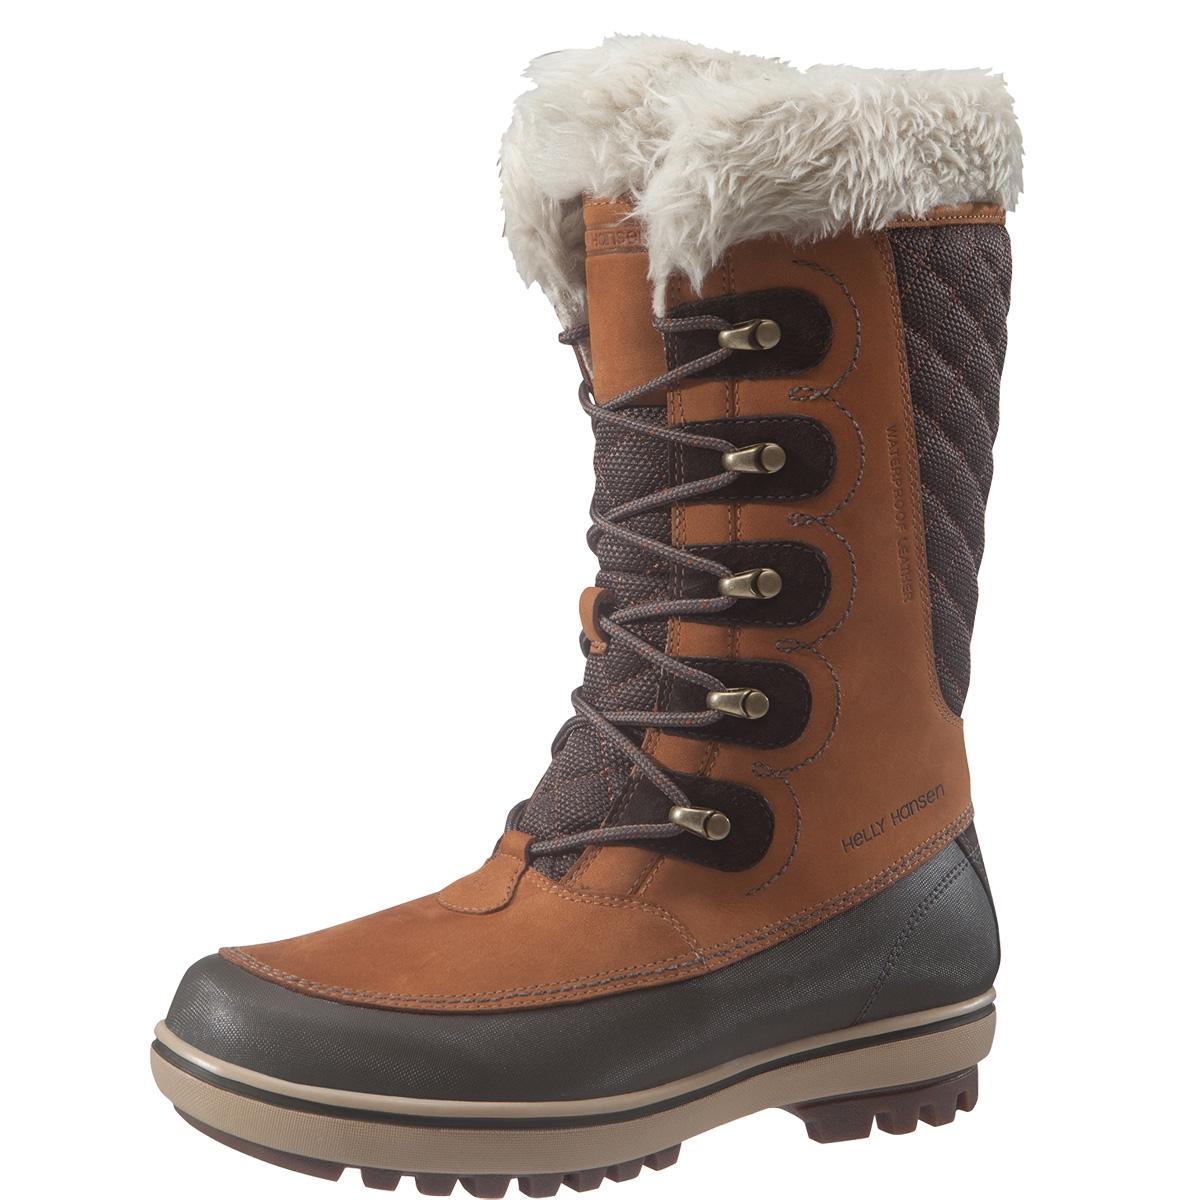 womens walking boots image of helly hansen garibaldi d-ring walking boots (womenu0027s) - whiskey/  ... afgofzu